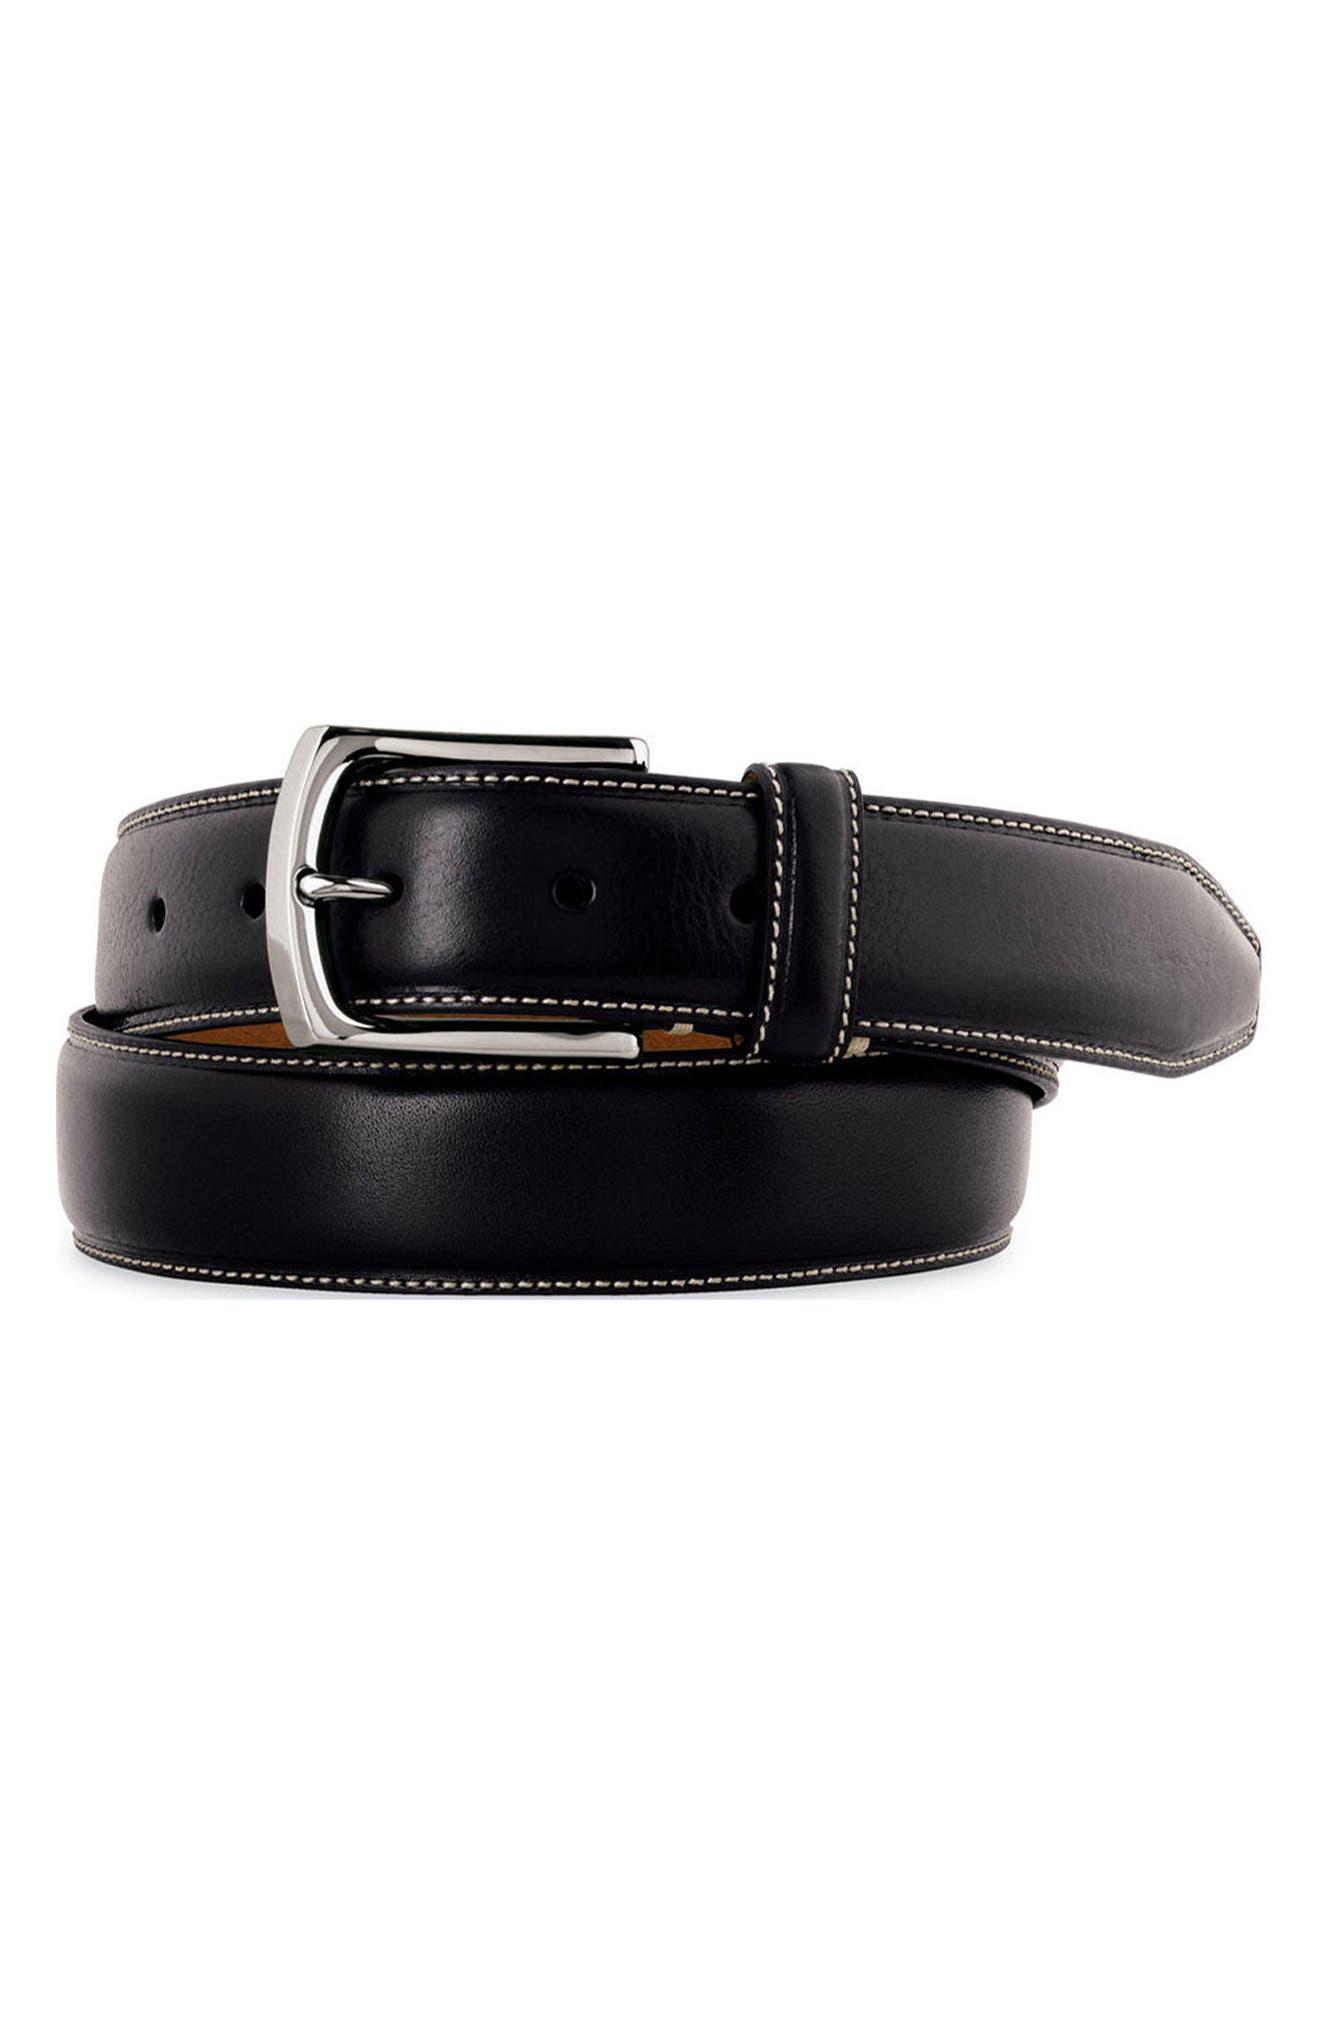 Calfskin Leather Belt,                             Main thumbnail 1, color,                             001